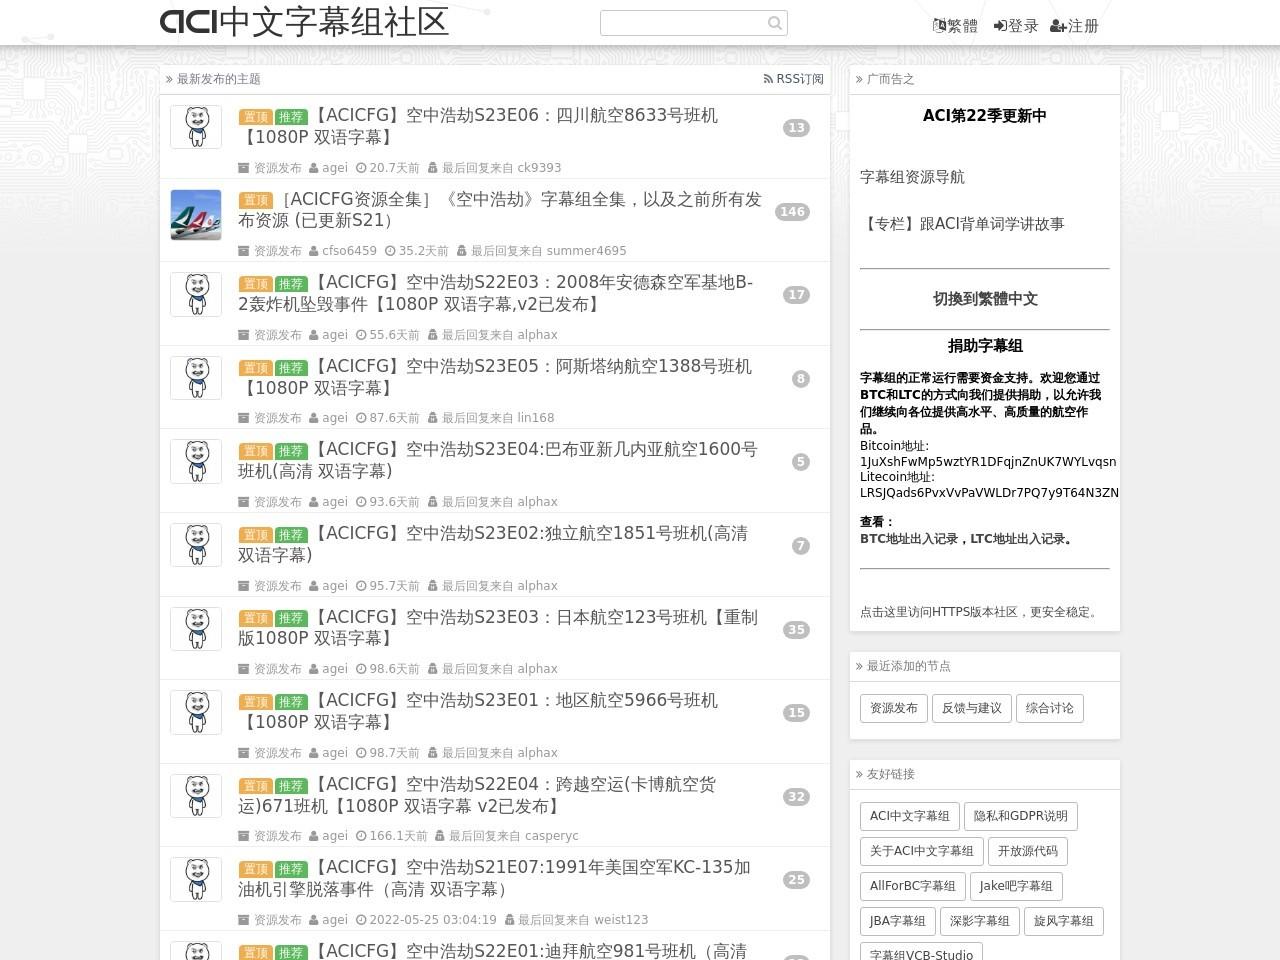 ACI中文字幕组社区 - ATOM Feed